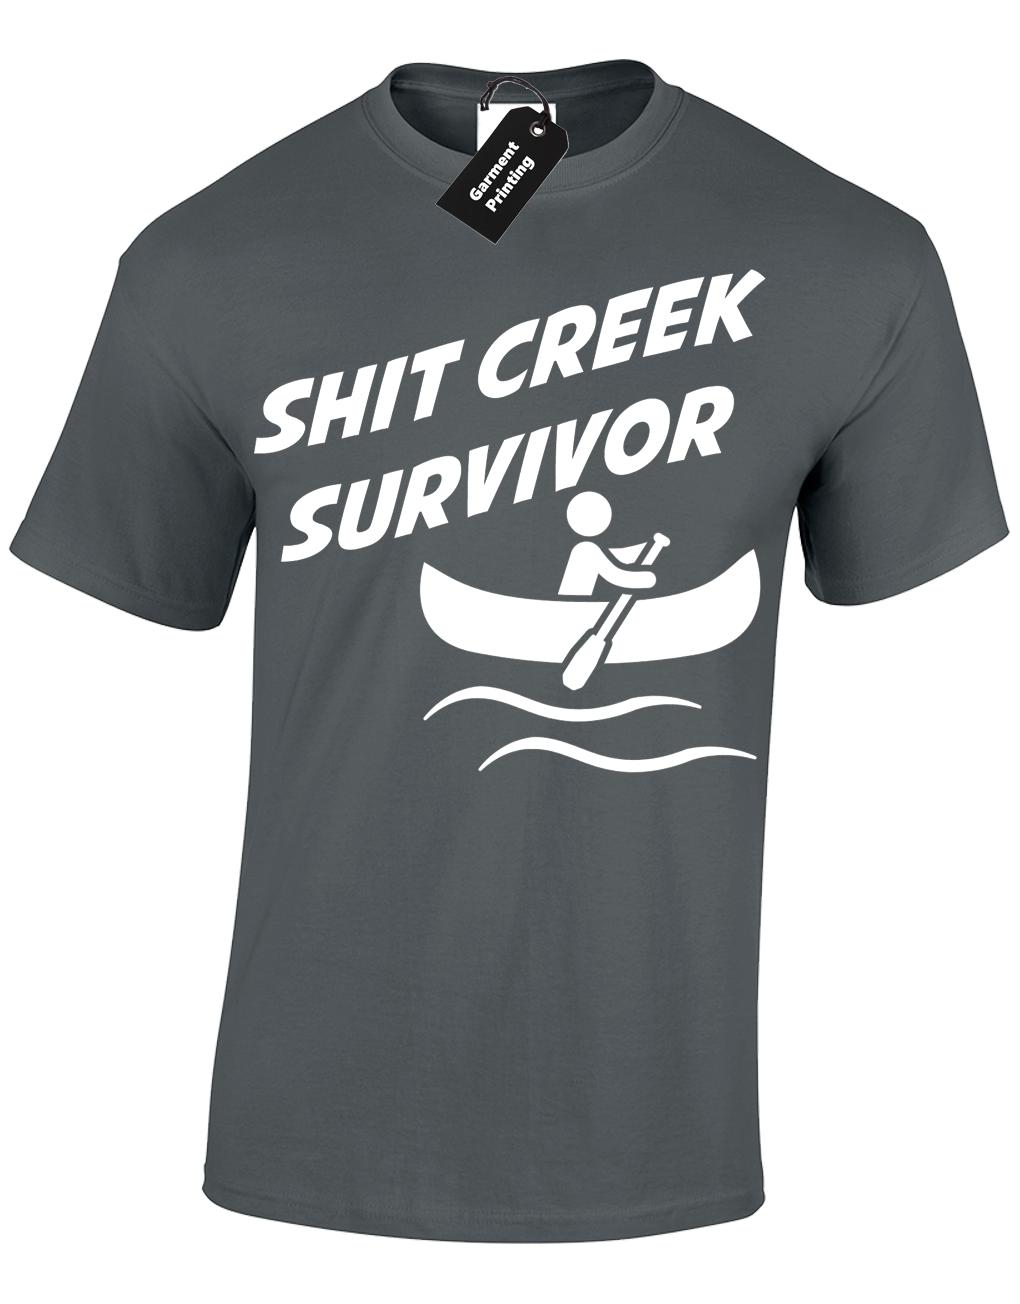 Sh*t Creek Survivor T-Shirt